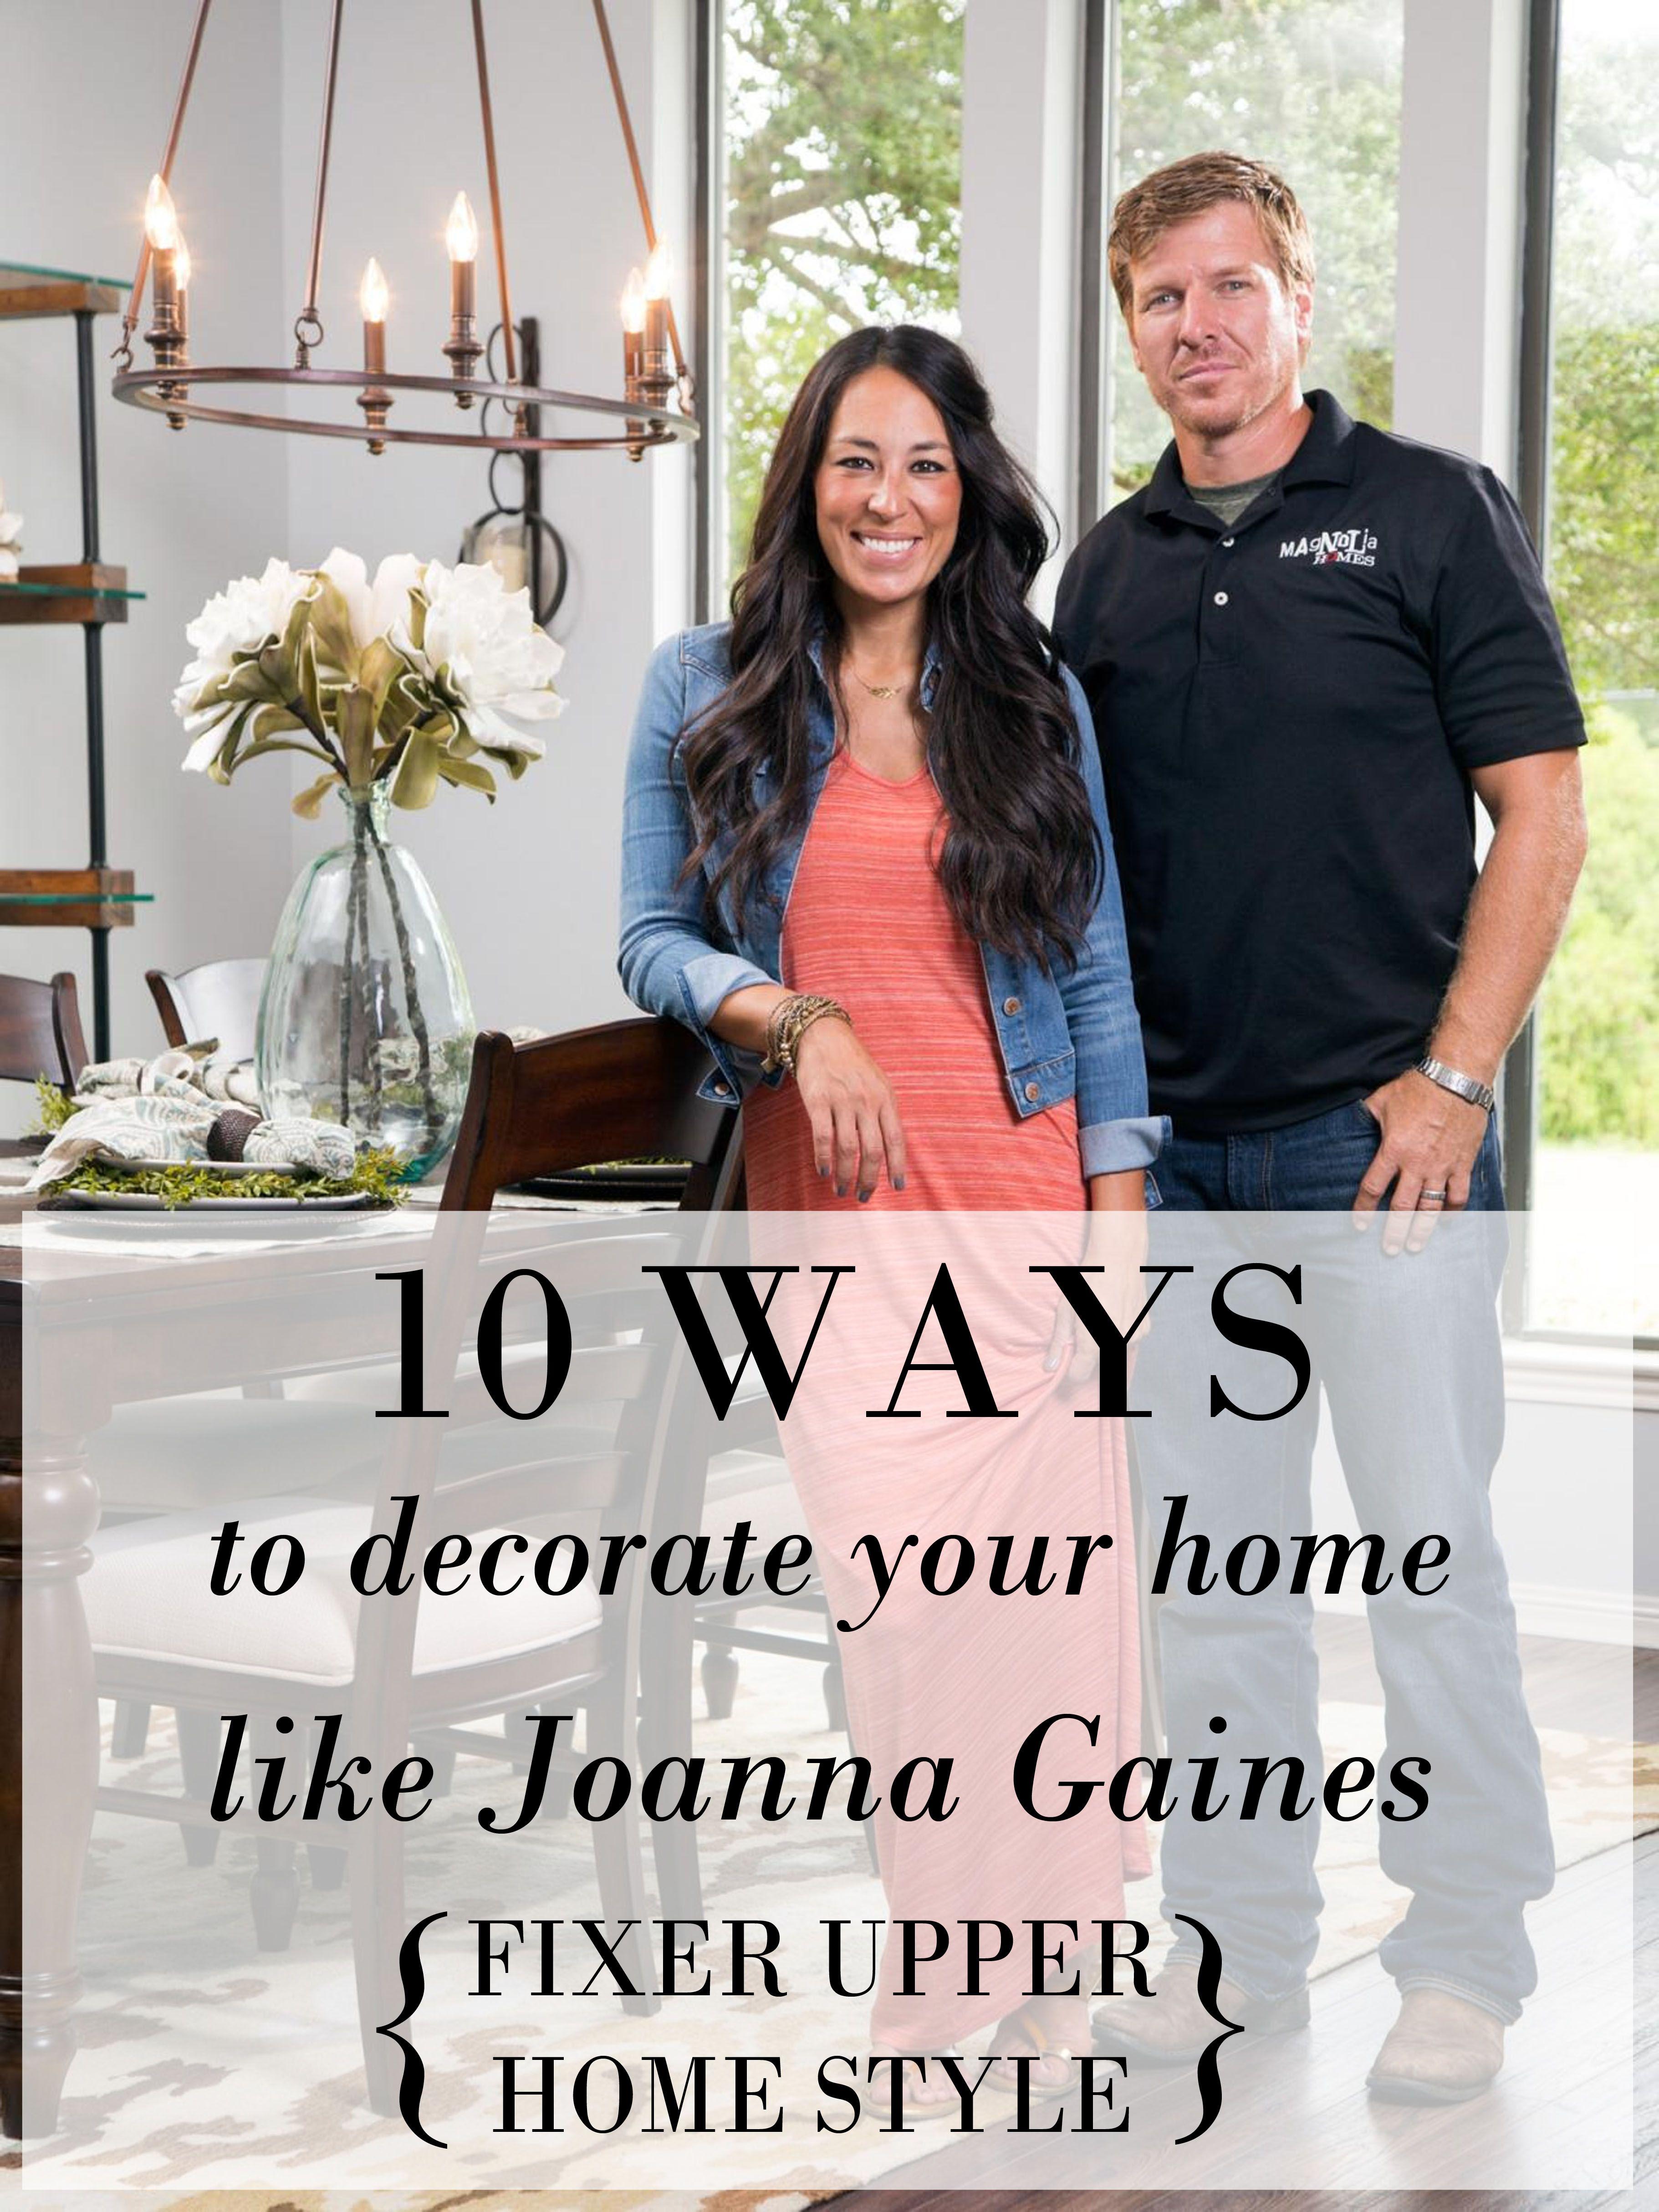 Decorating like joanna gaines - 10 Ways To Decorate Like Joanna Gaines